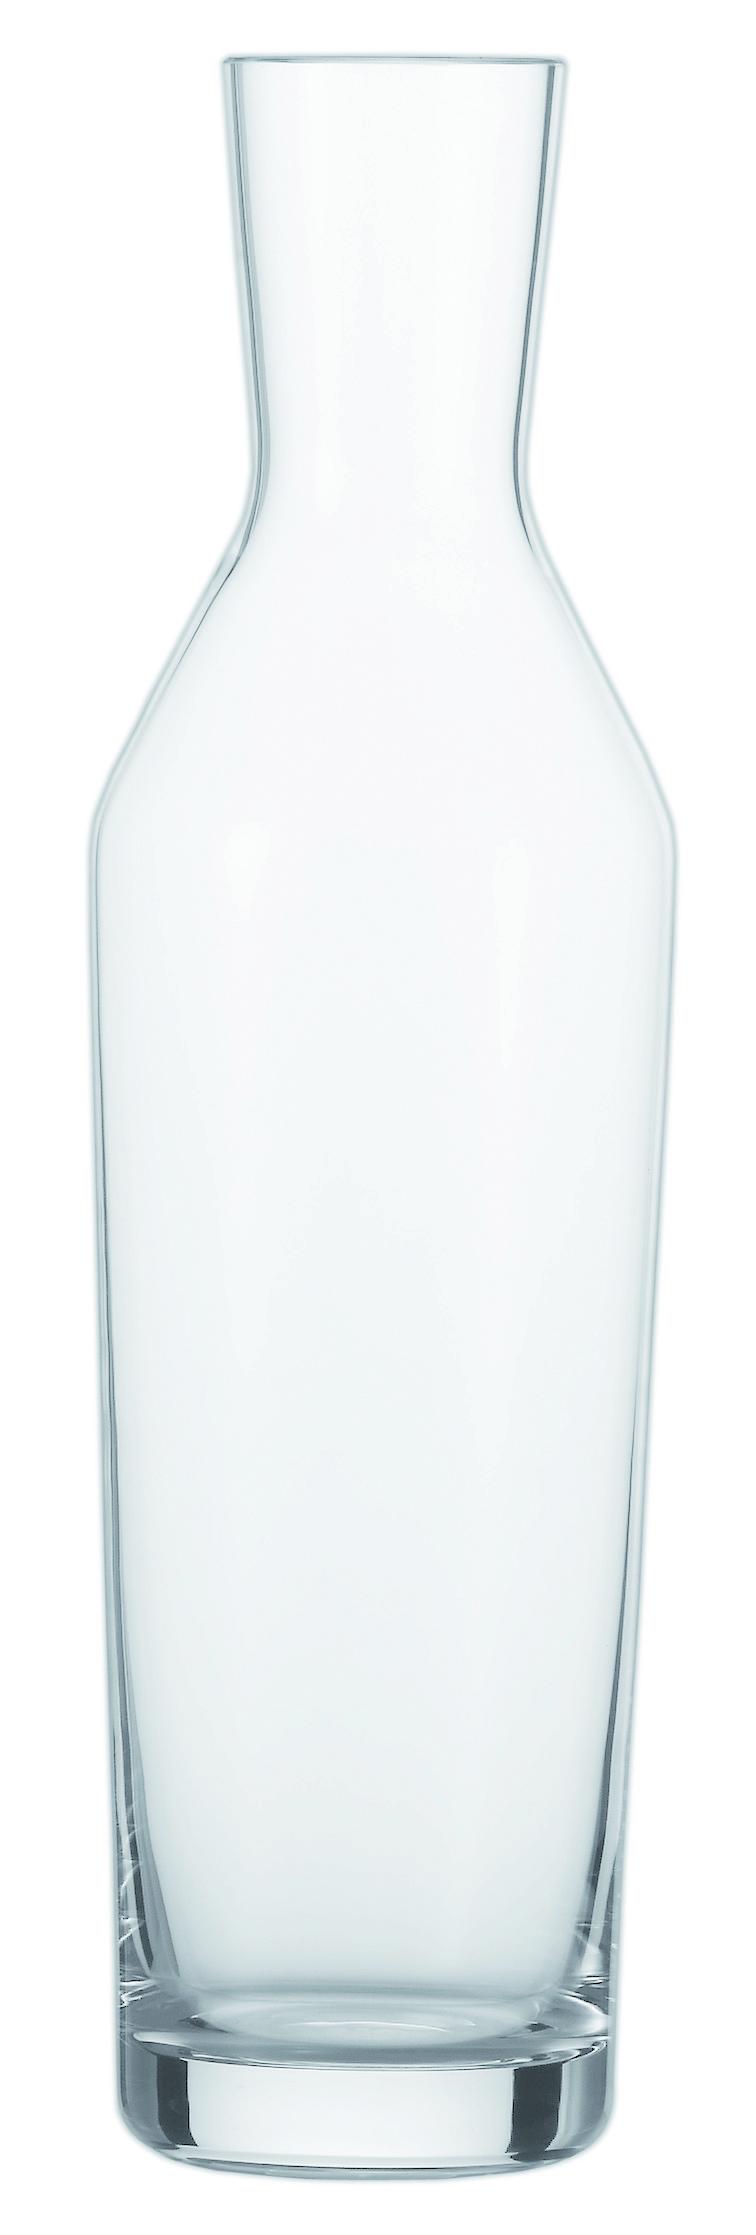 Waterkaraf nr. 2 - Basic bar Selection